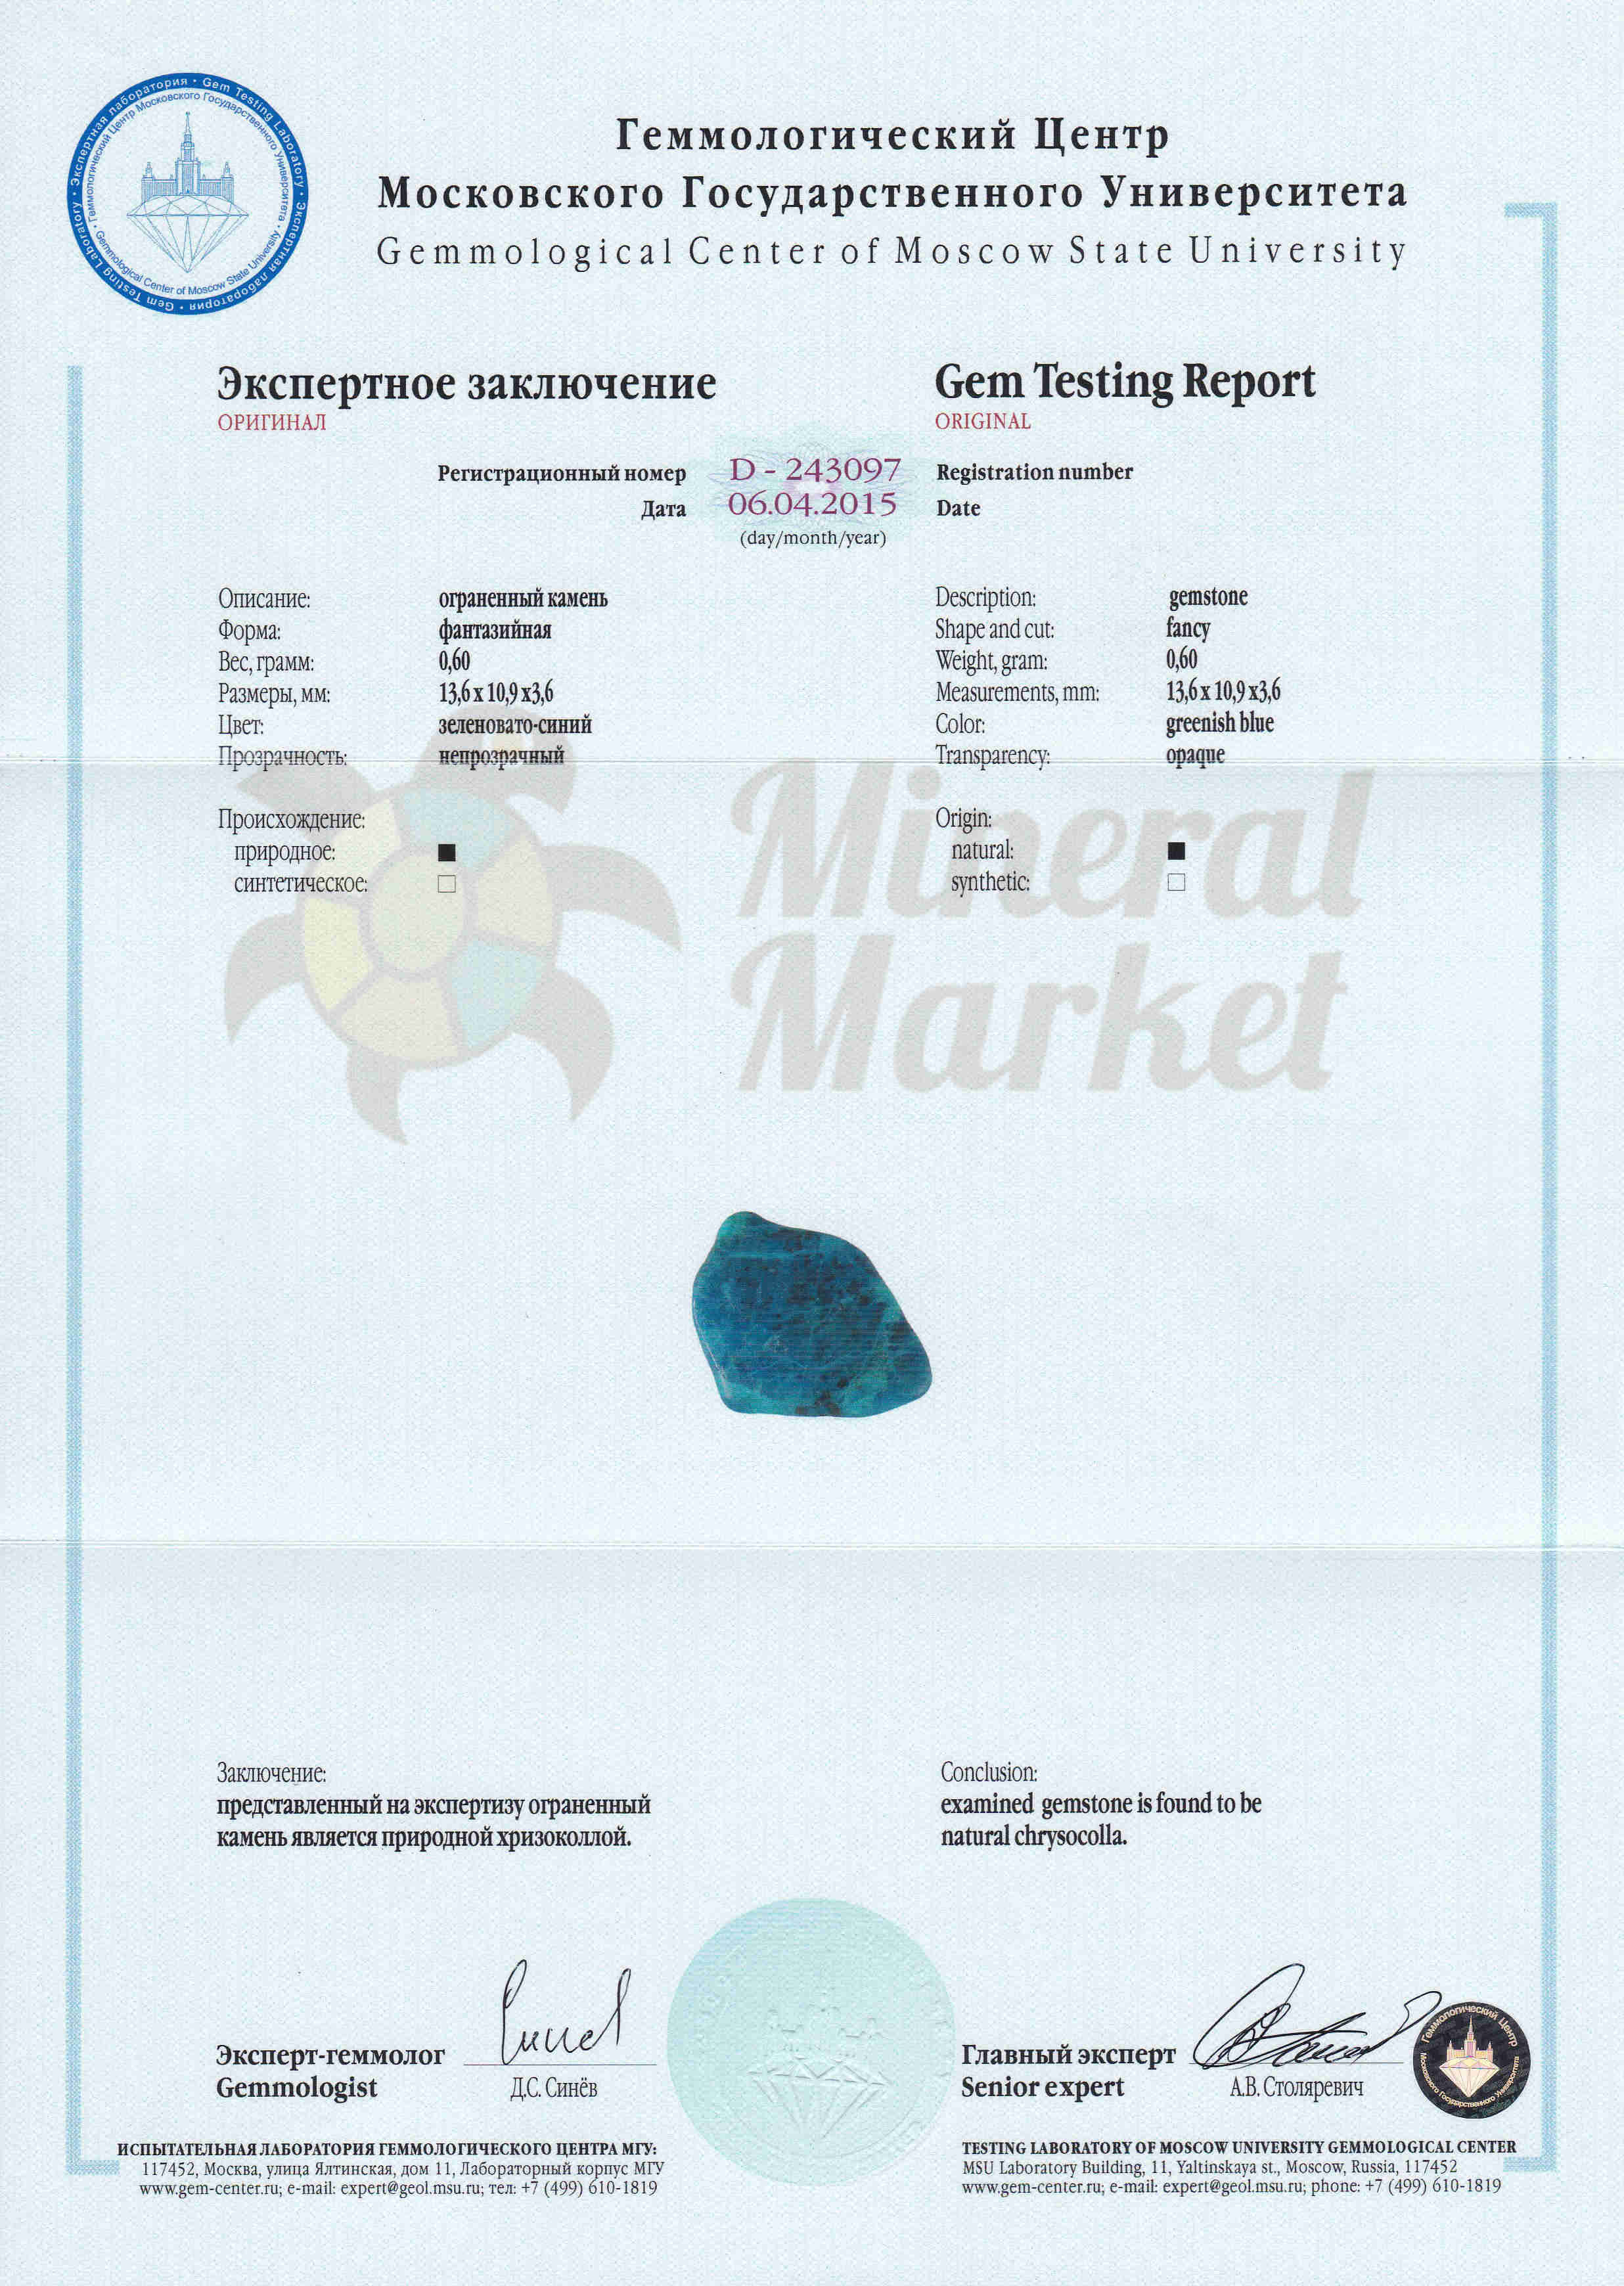 http://mineralmarket.ru/img/certificate/133.jpg